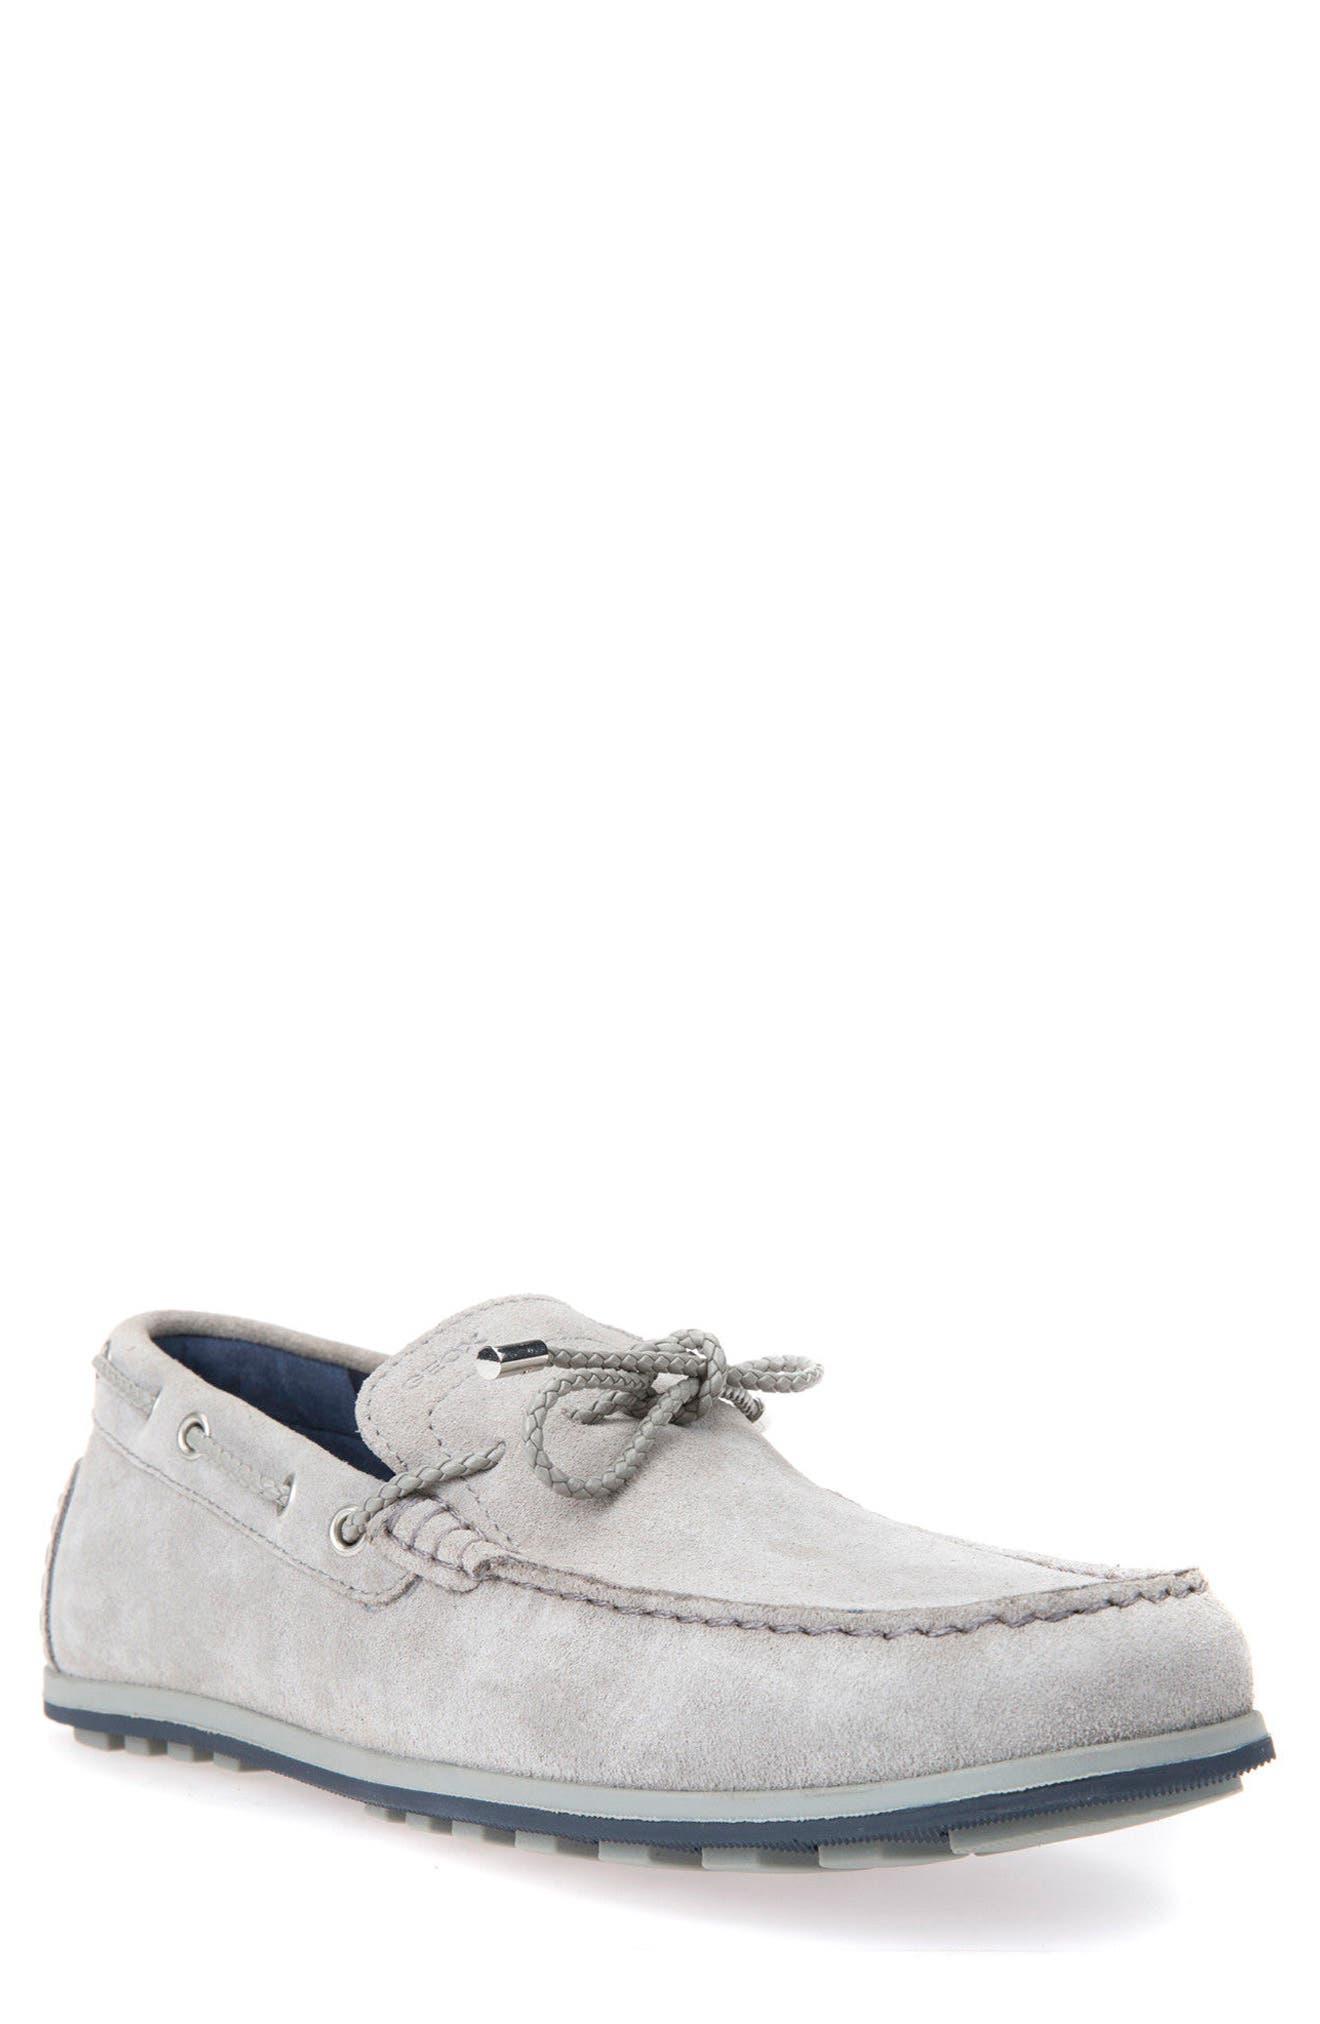 Mirvin 2 Boat Shoe,                         Main,                         color, 030